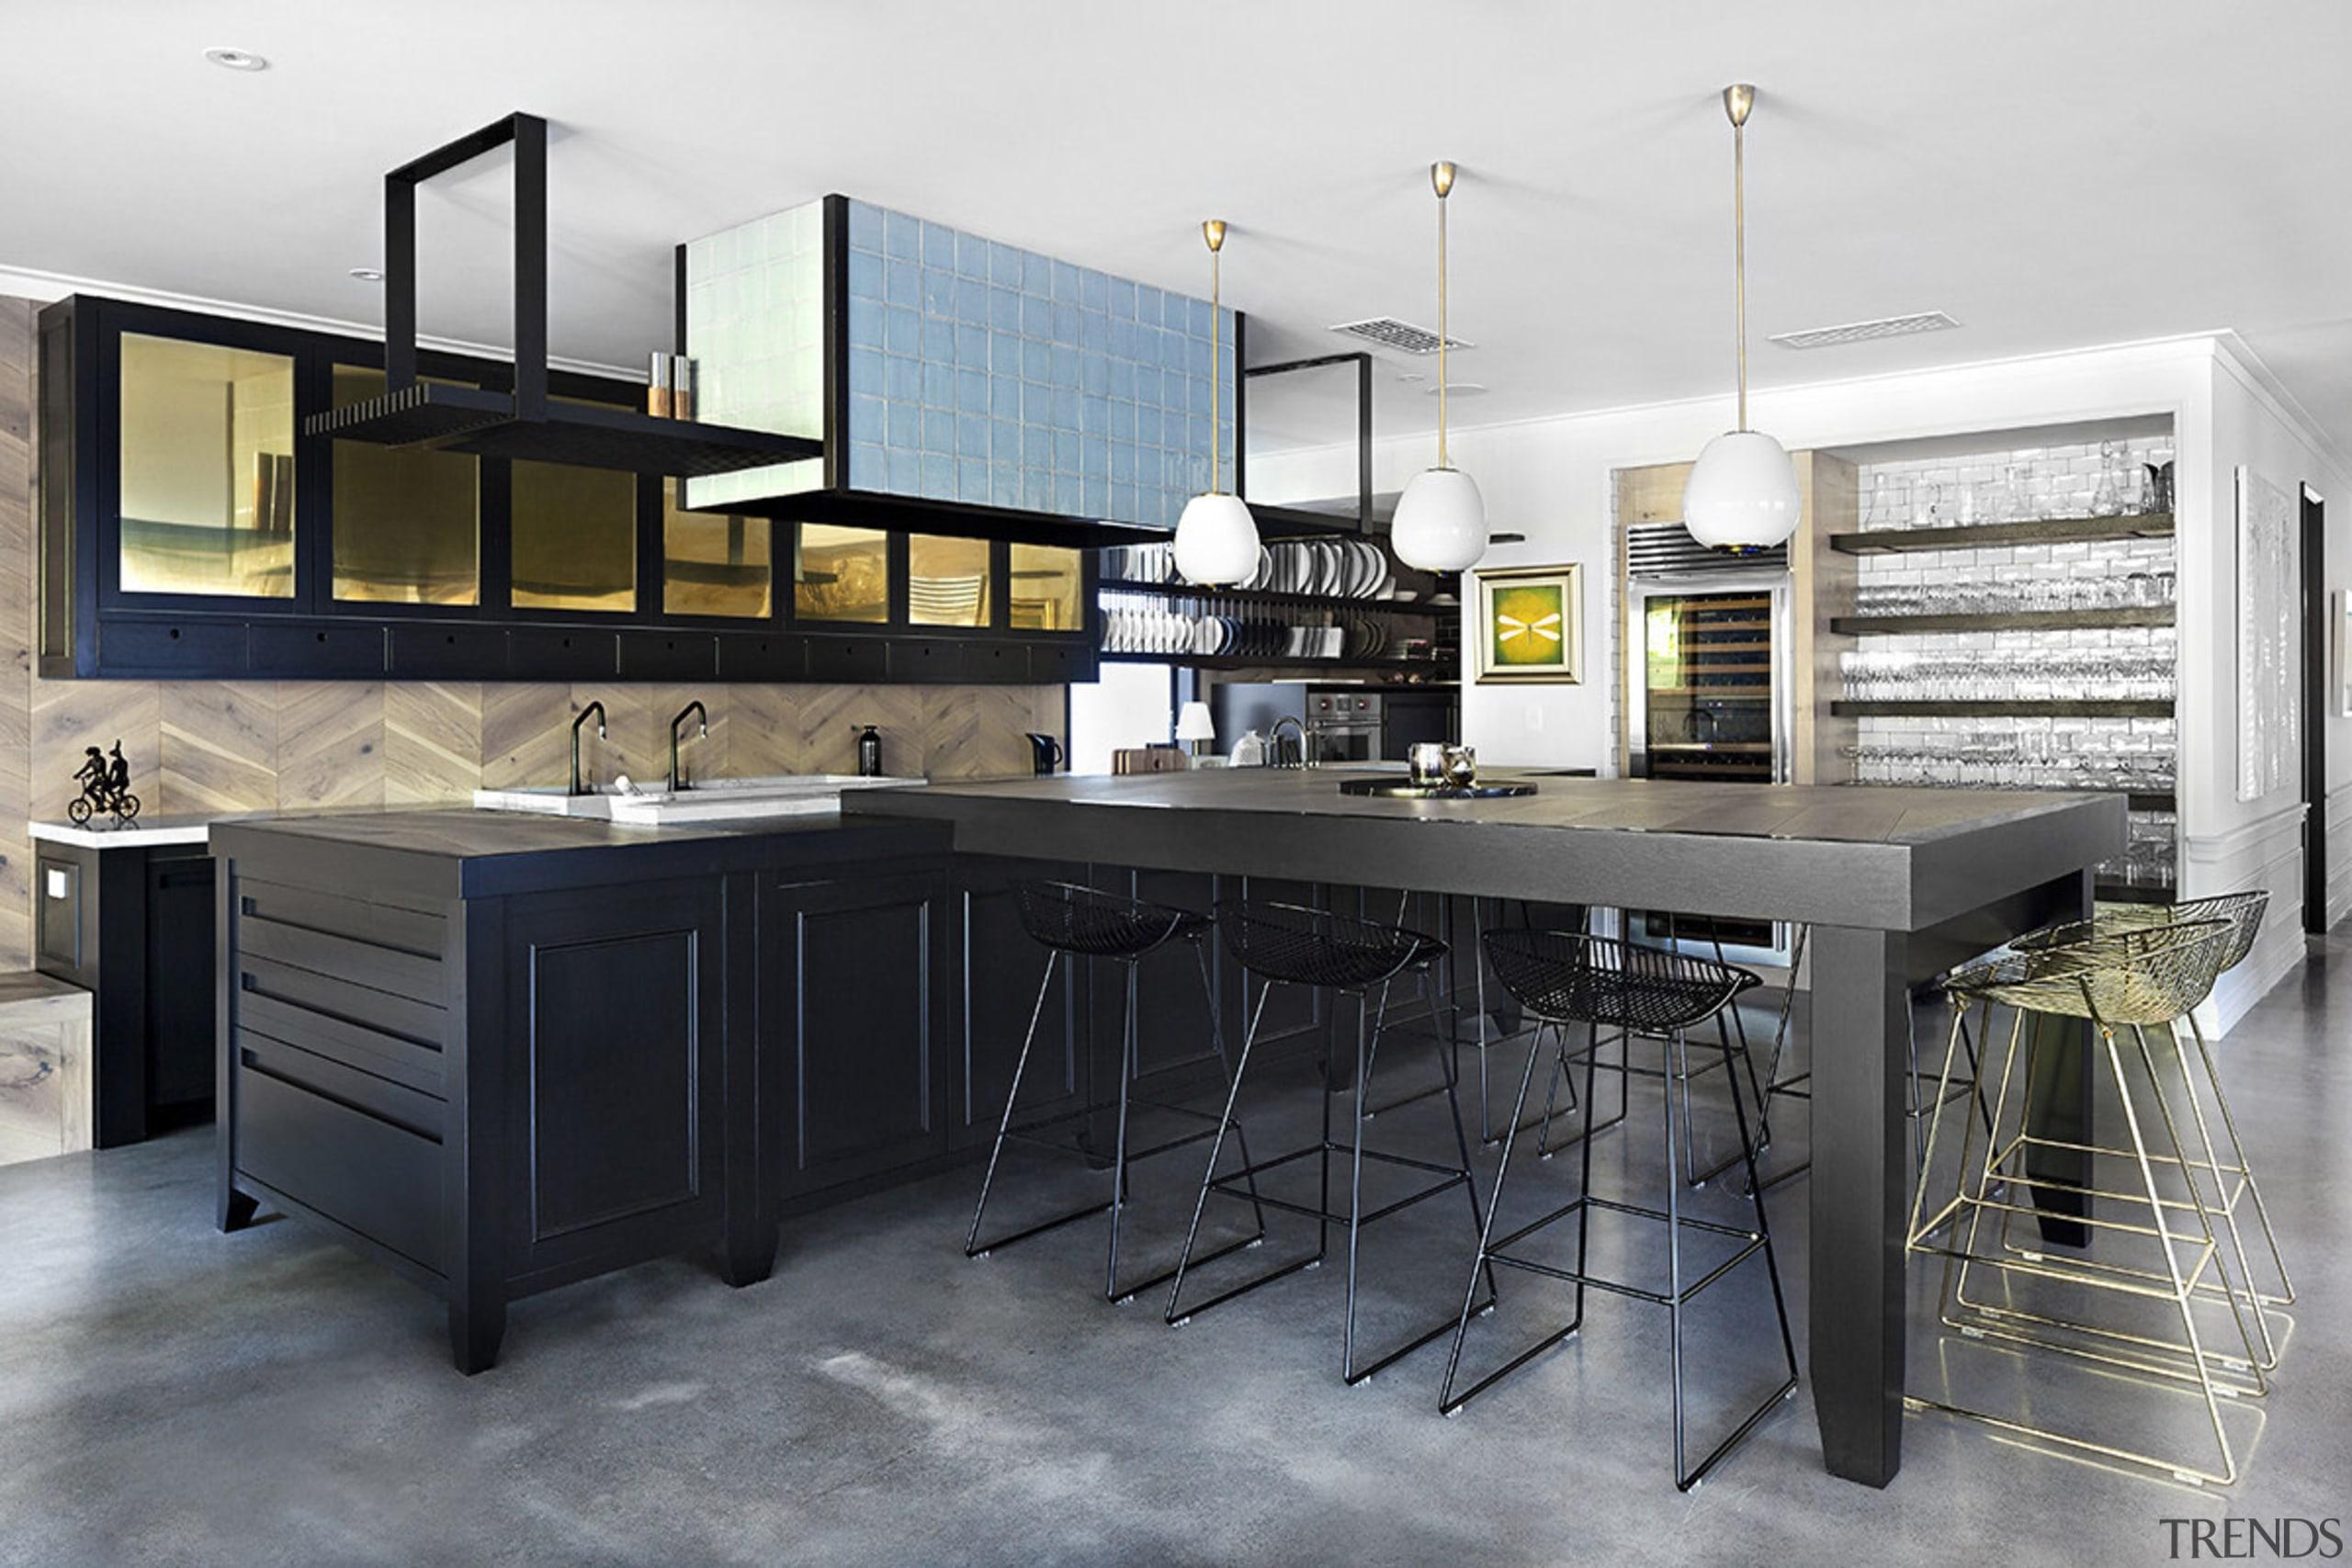 The kitchen runs along the central axis of countertop, cuisine classique, furniture, interior design, kitchen, gray, white, black